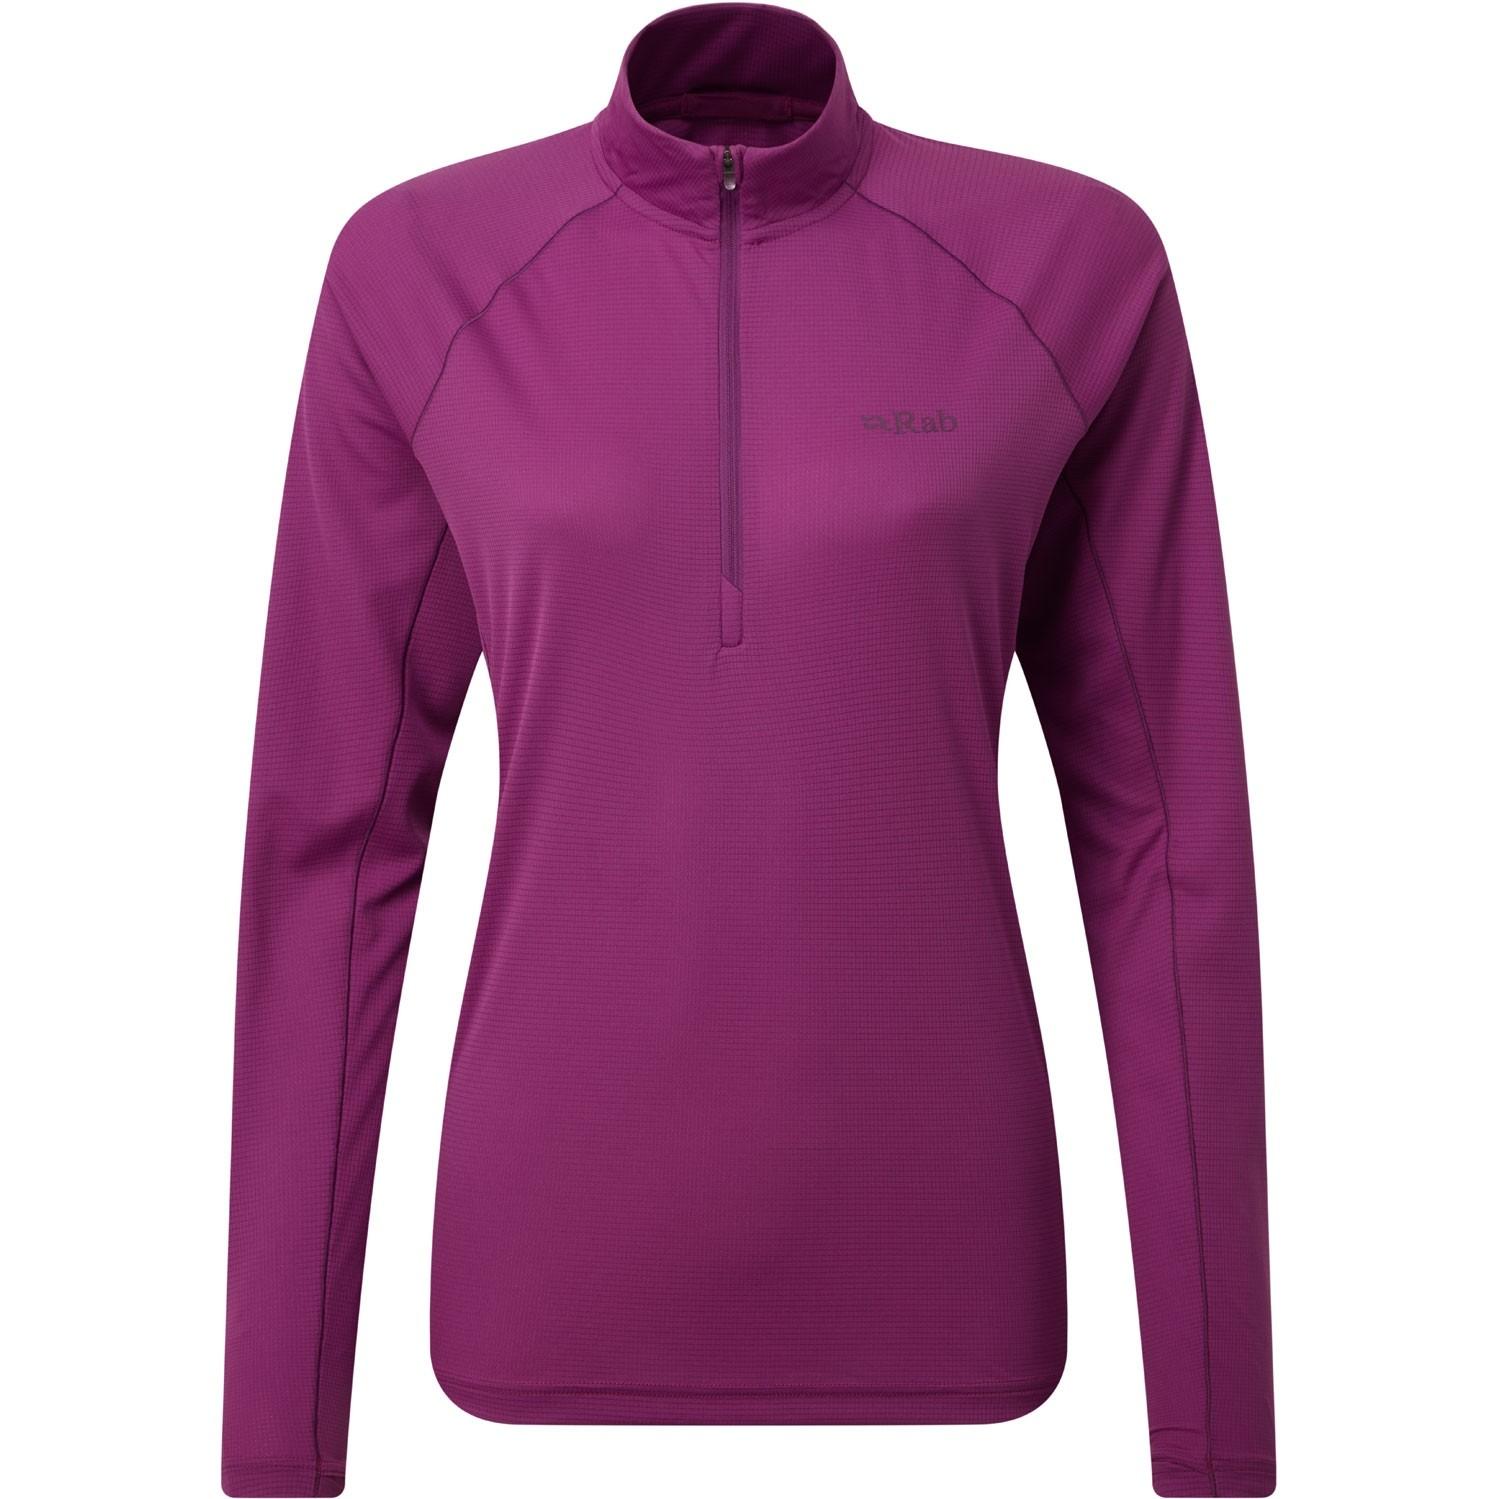 Rab Pulse Long Sleeve Zip Women's Baselayer - Violet